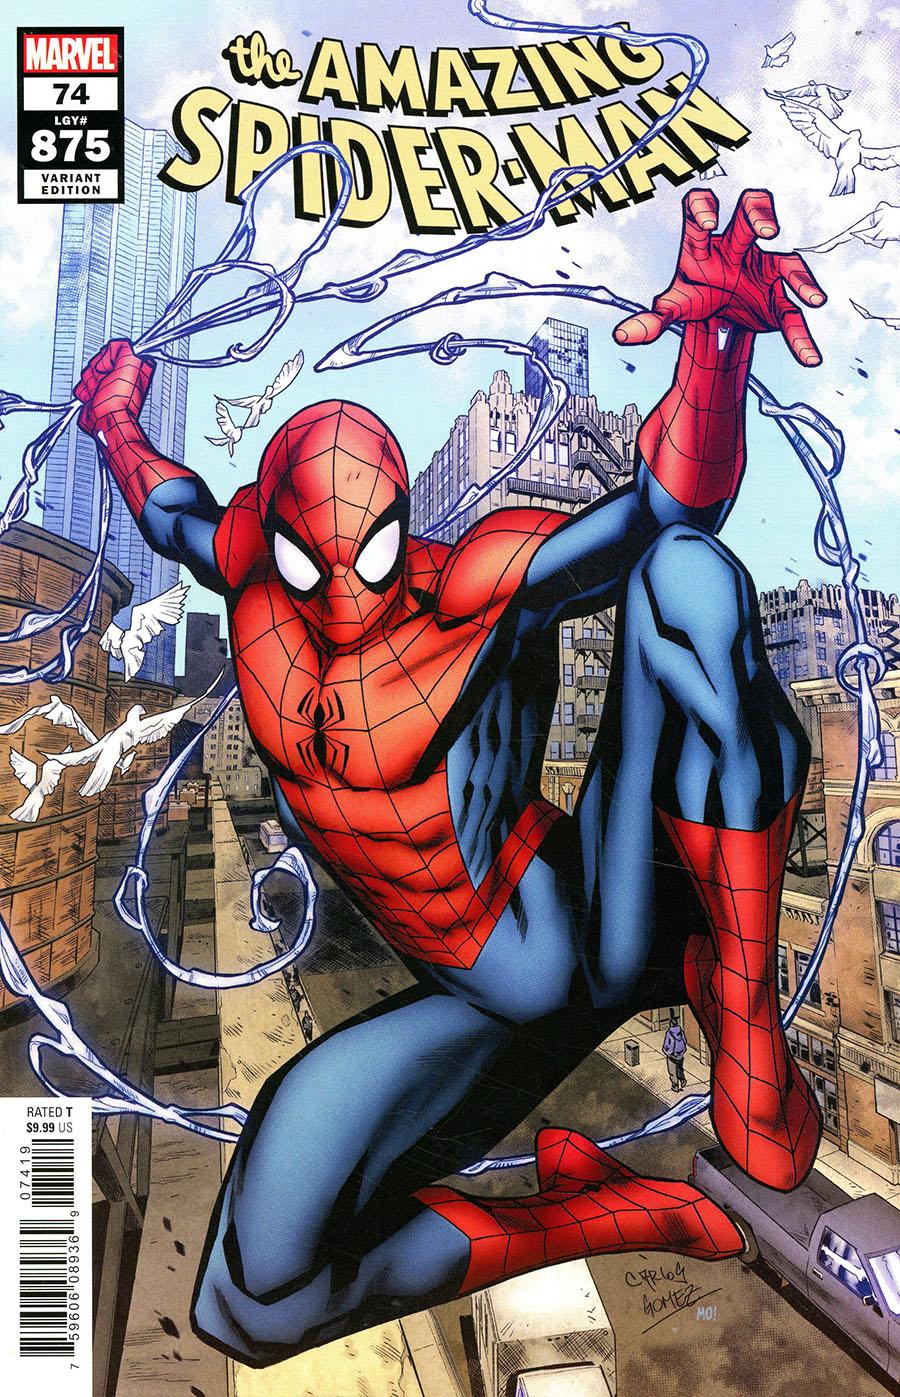 Amazing Spider-Man Vol 5 #74 Cover J Variant Carlos Gomez Cover (#875)